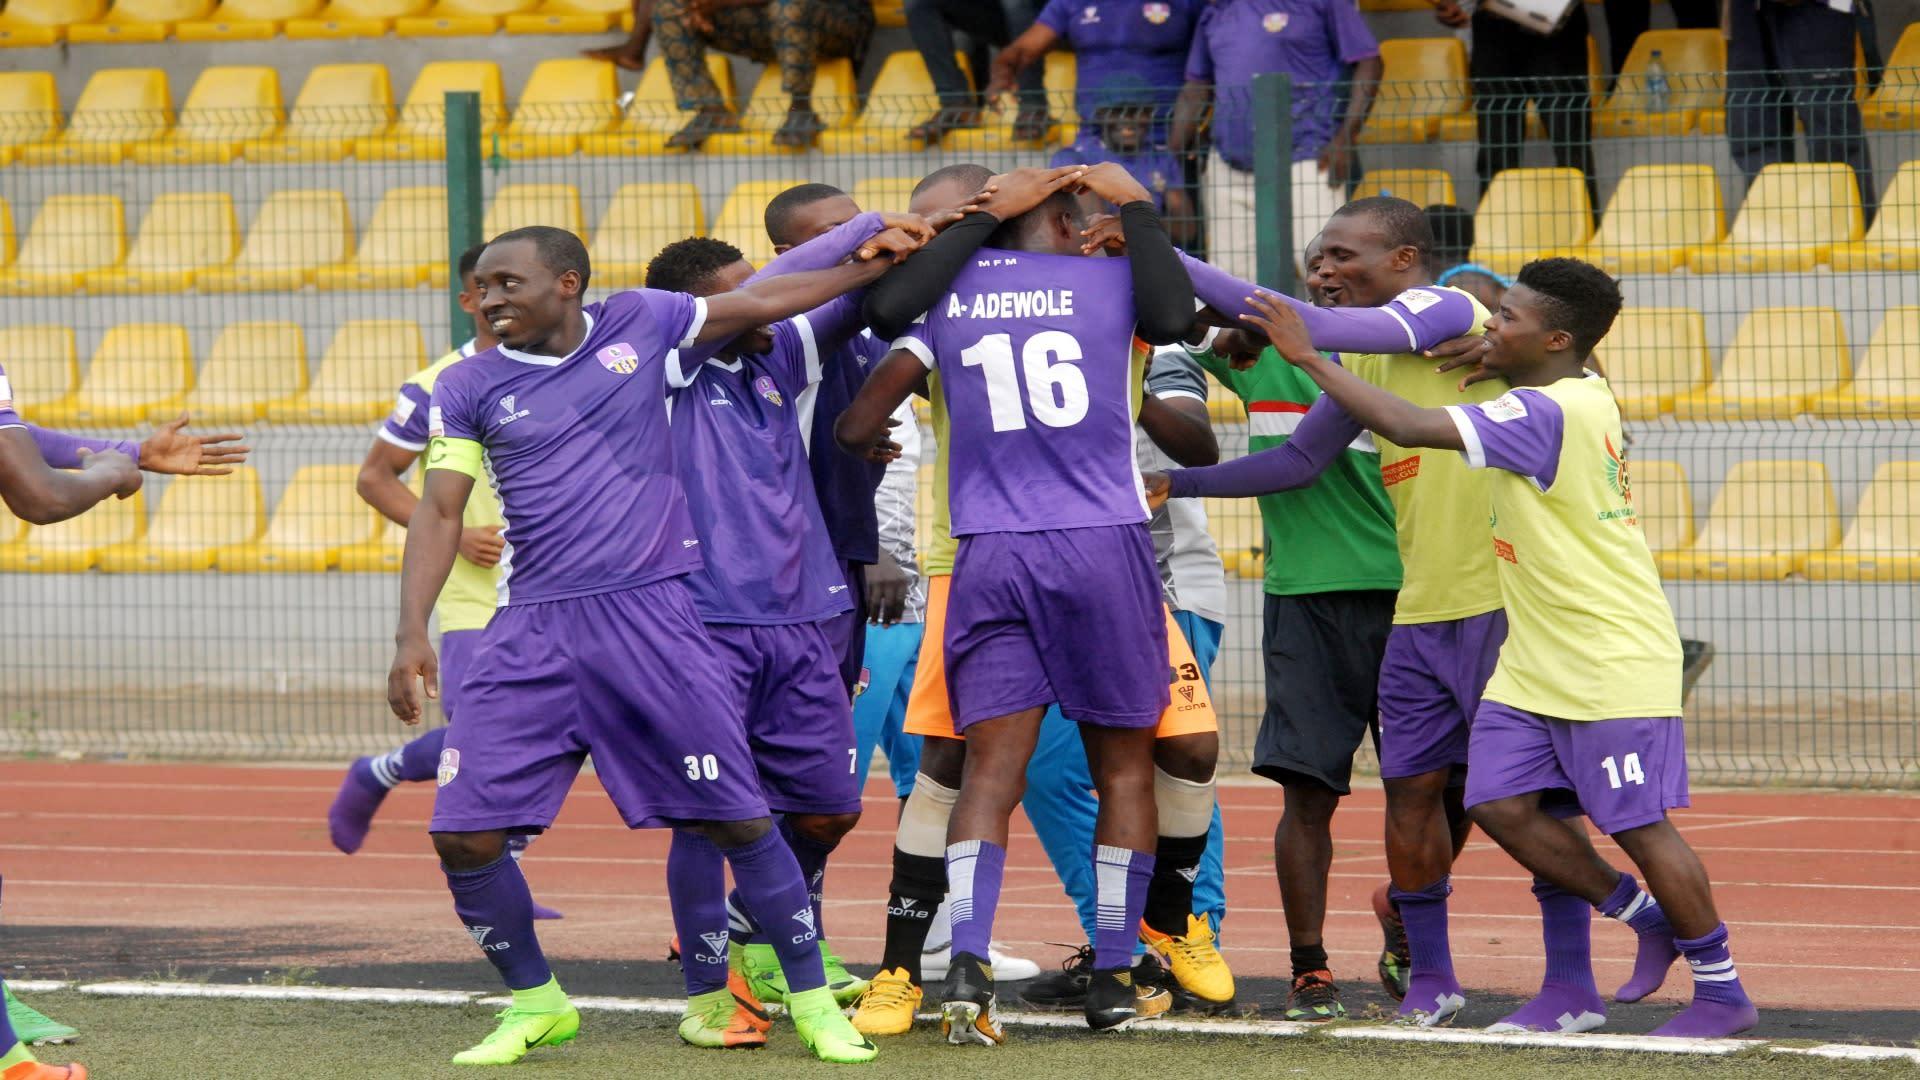 Tony Bolus: MFM unveil new coach to replace Fidelis Ilechukwu - Yahoo Sports